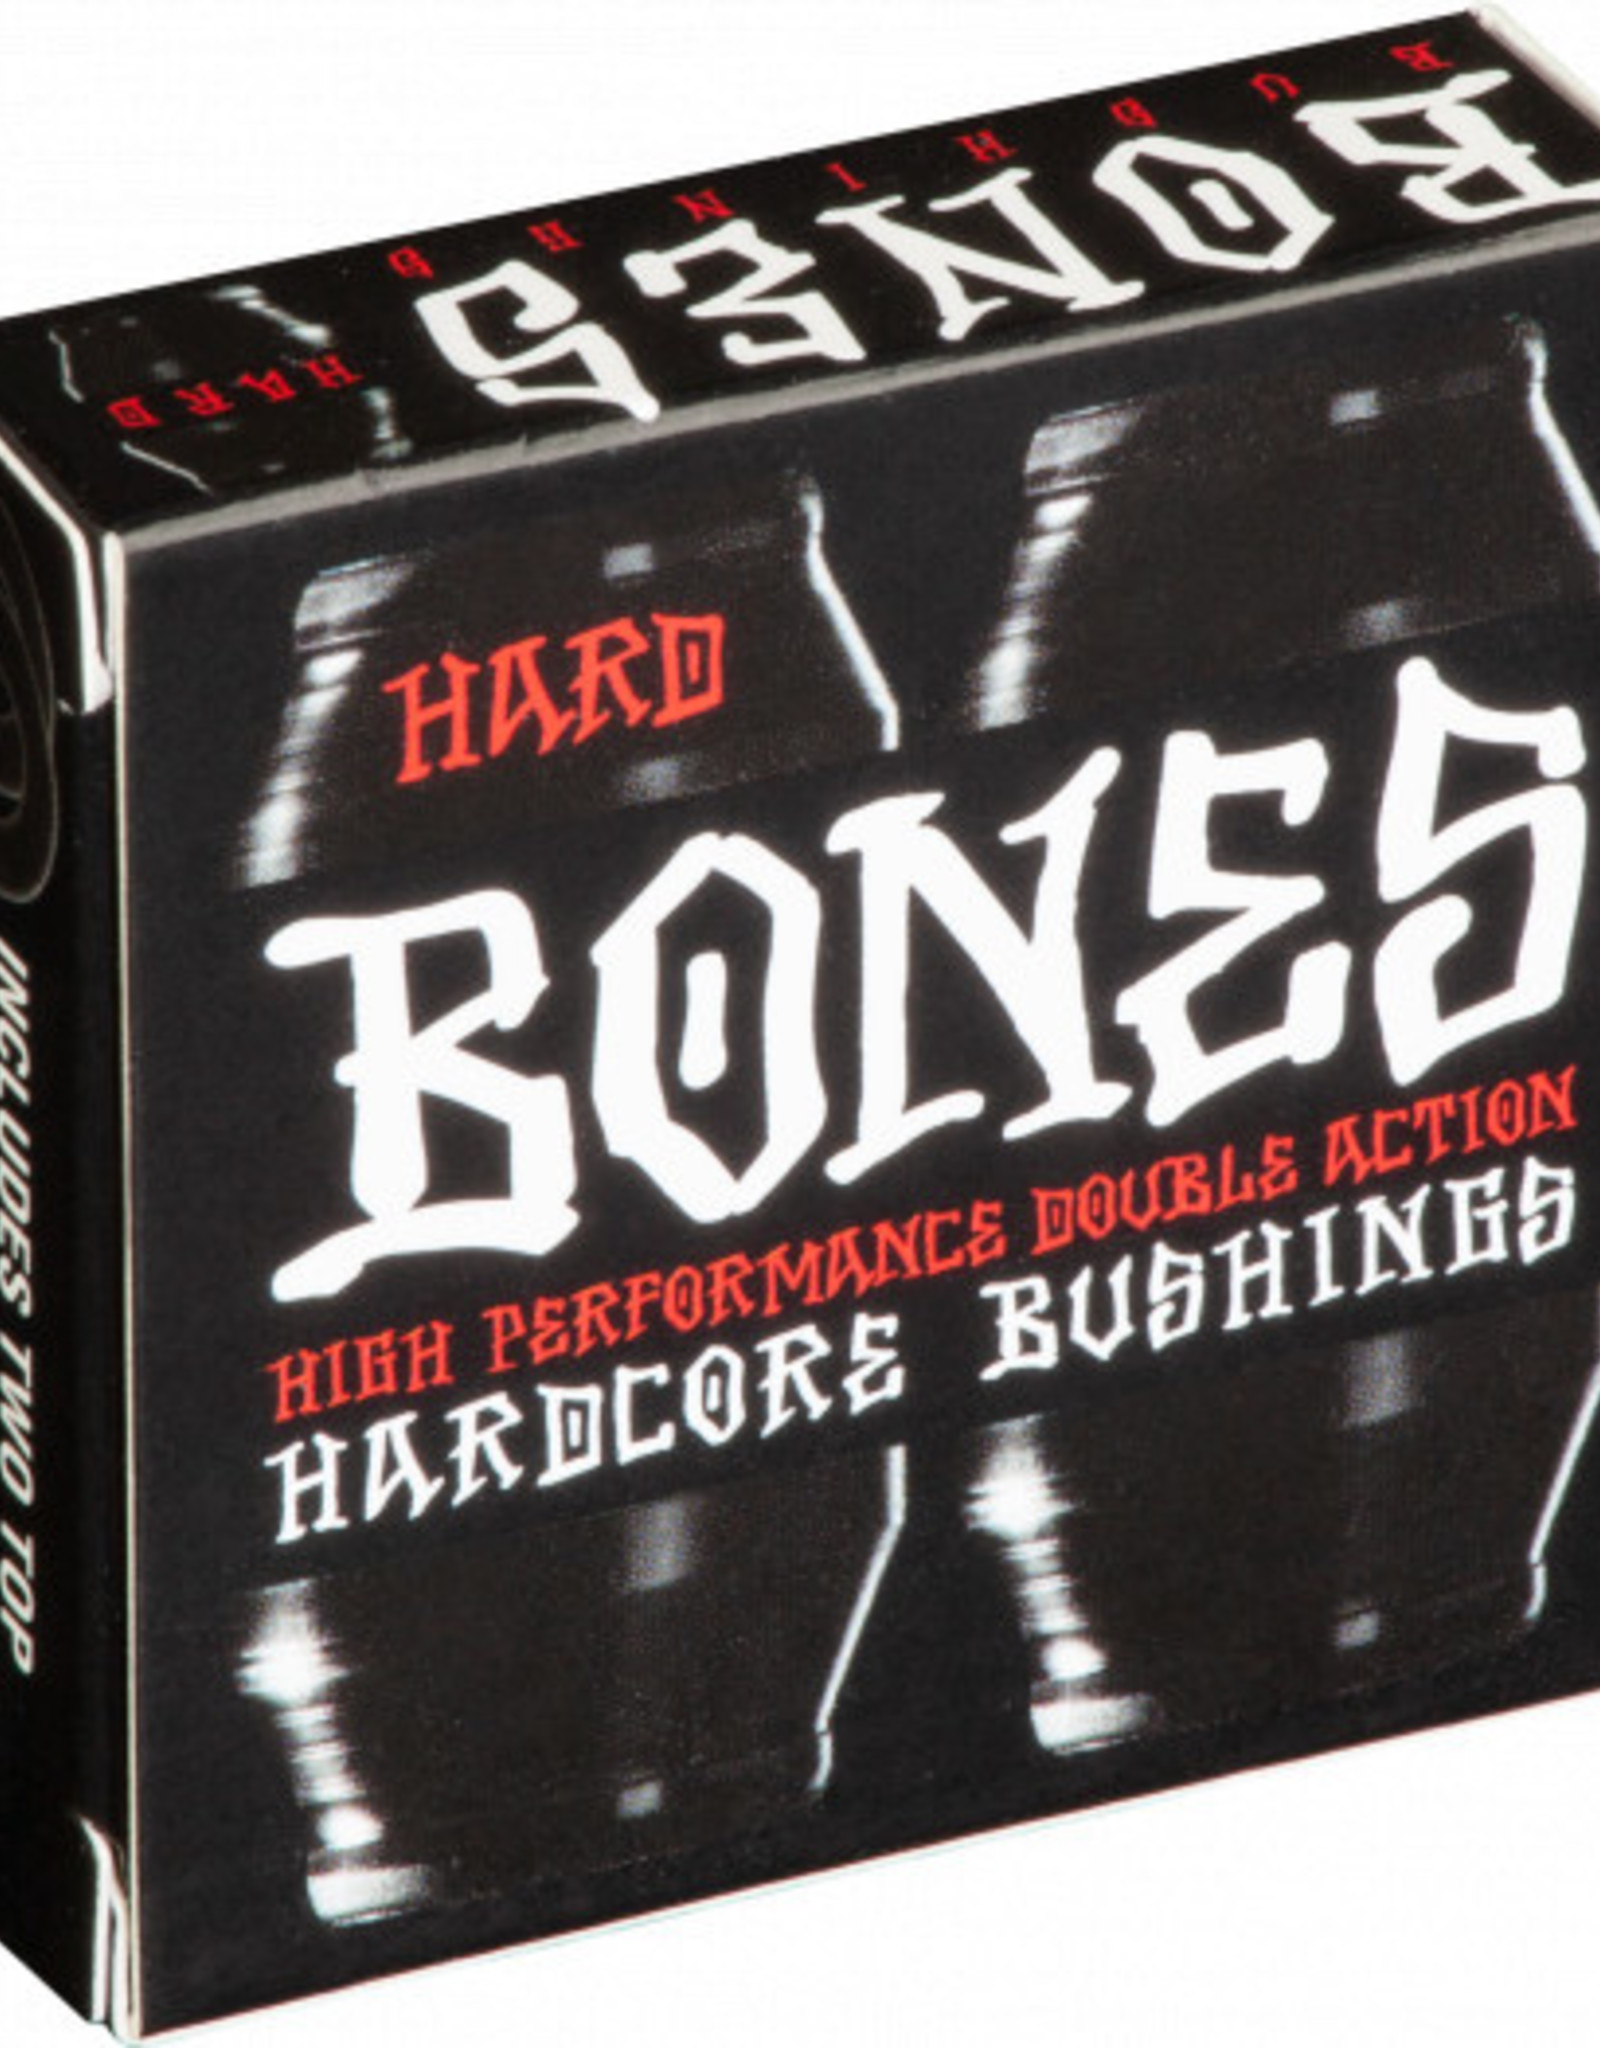 BONES HARDCORE BUSHINGS - HARD - BLACK PACK